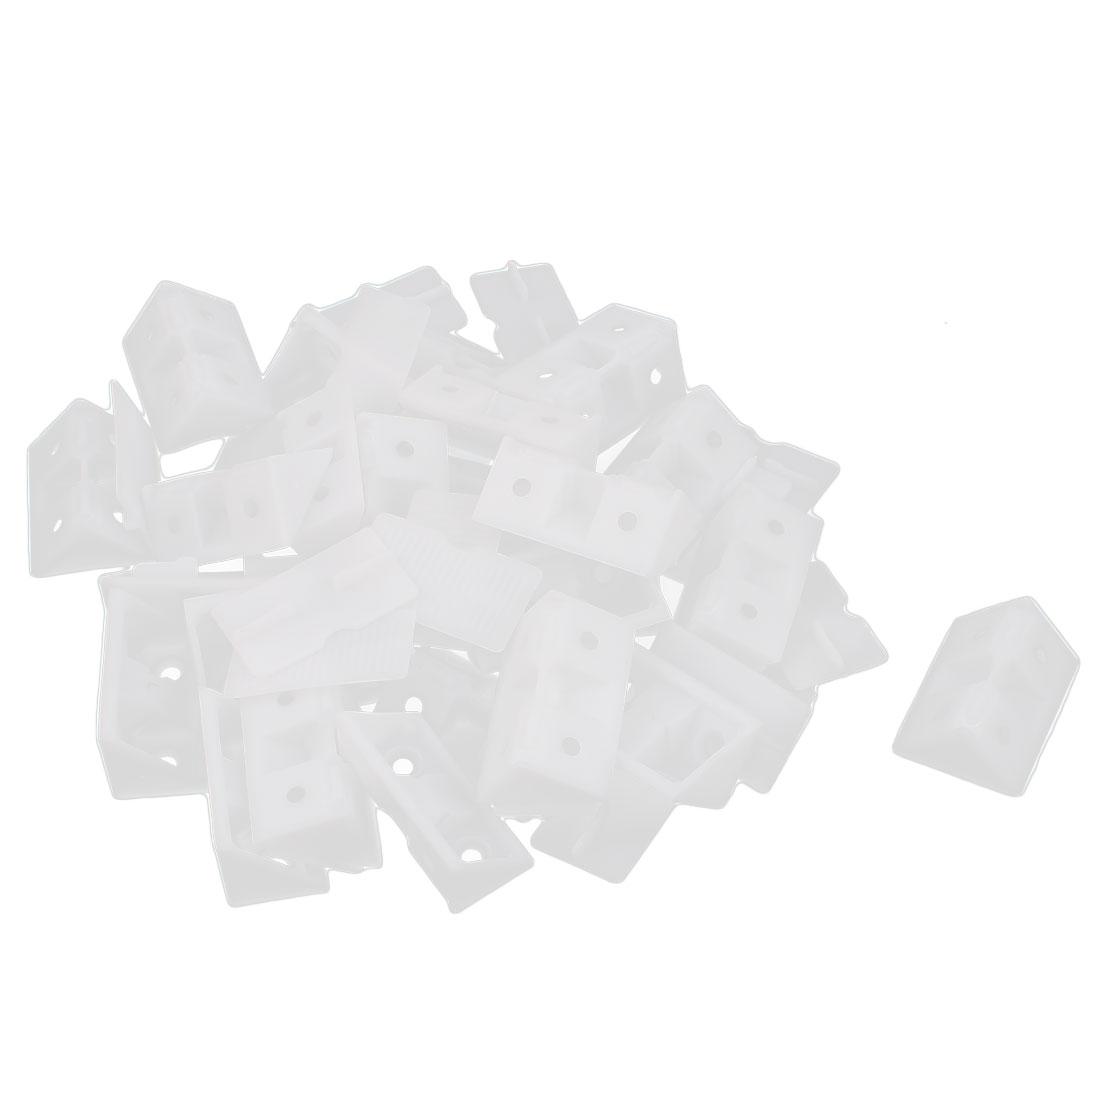 25pcs White Plastic Closet Cabinet 4 Holes Shelf Corner Brace Brackets Support